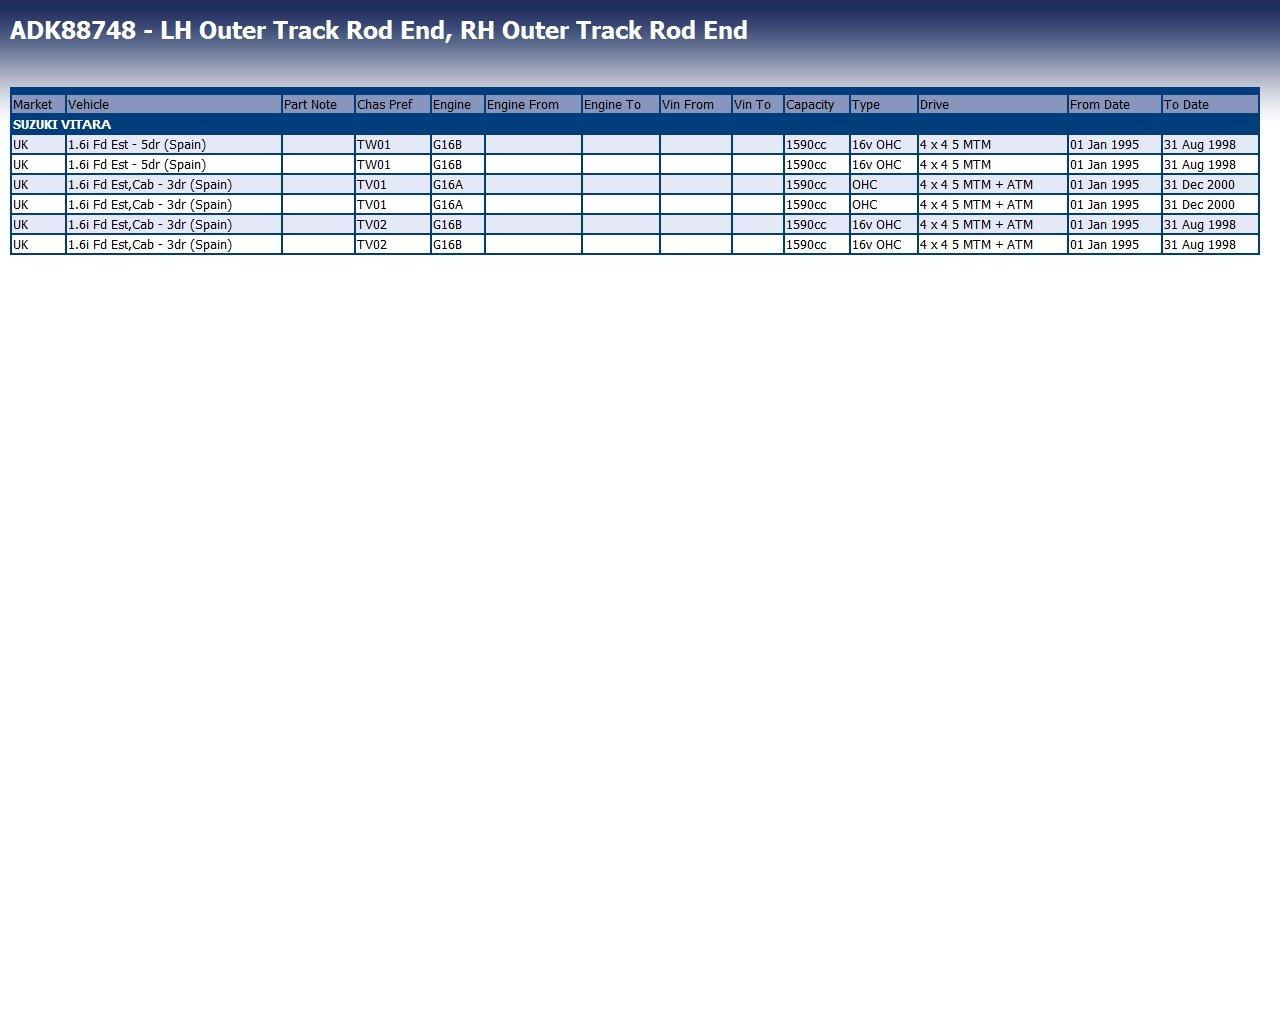 BP ADK88748 Testina Sterzo SX Esterna